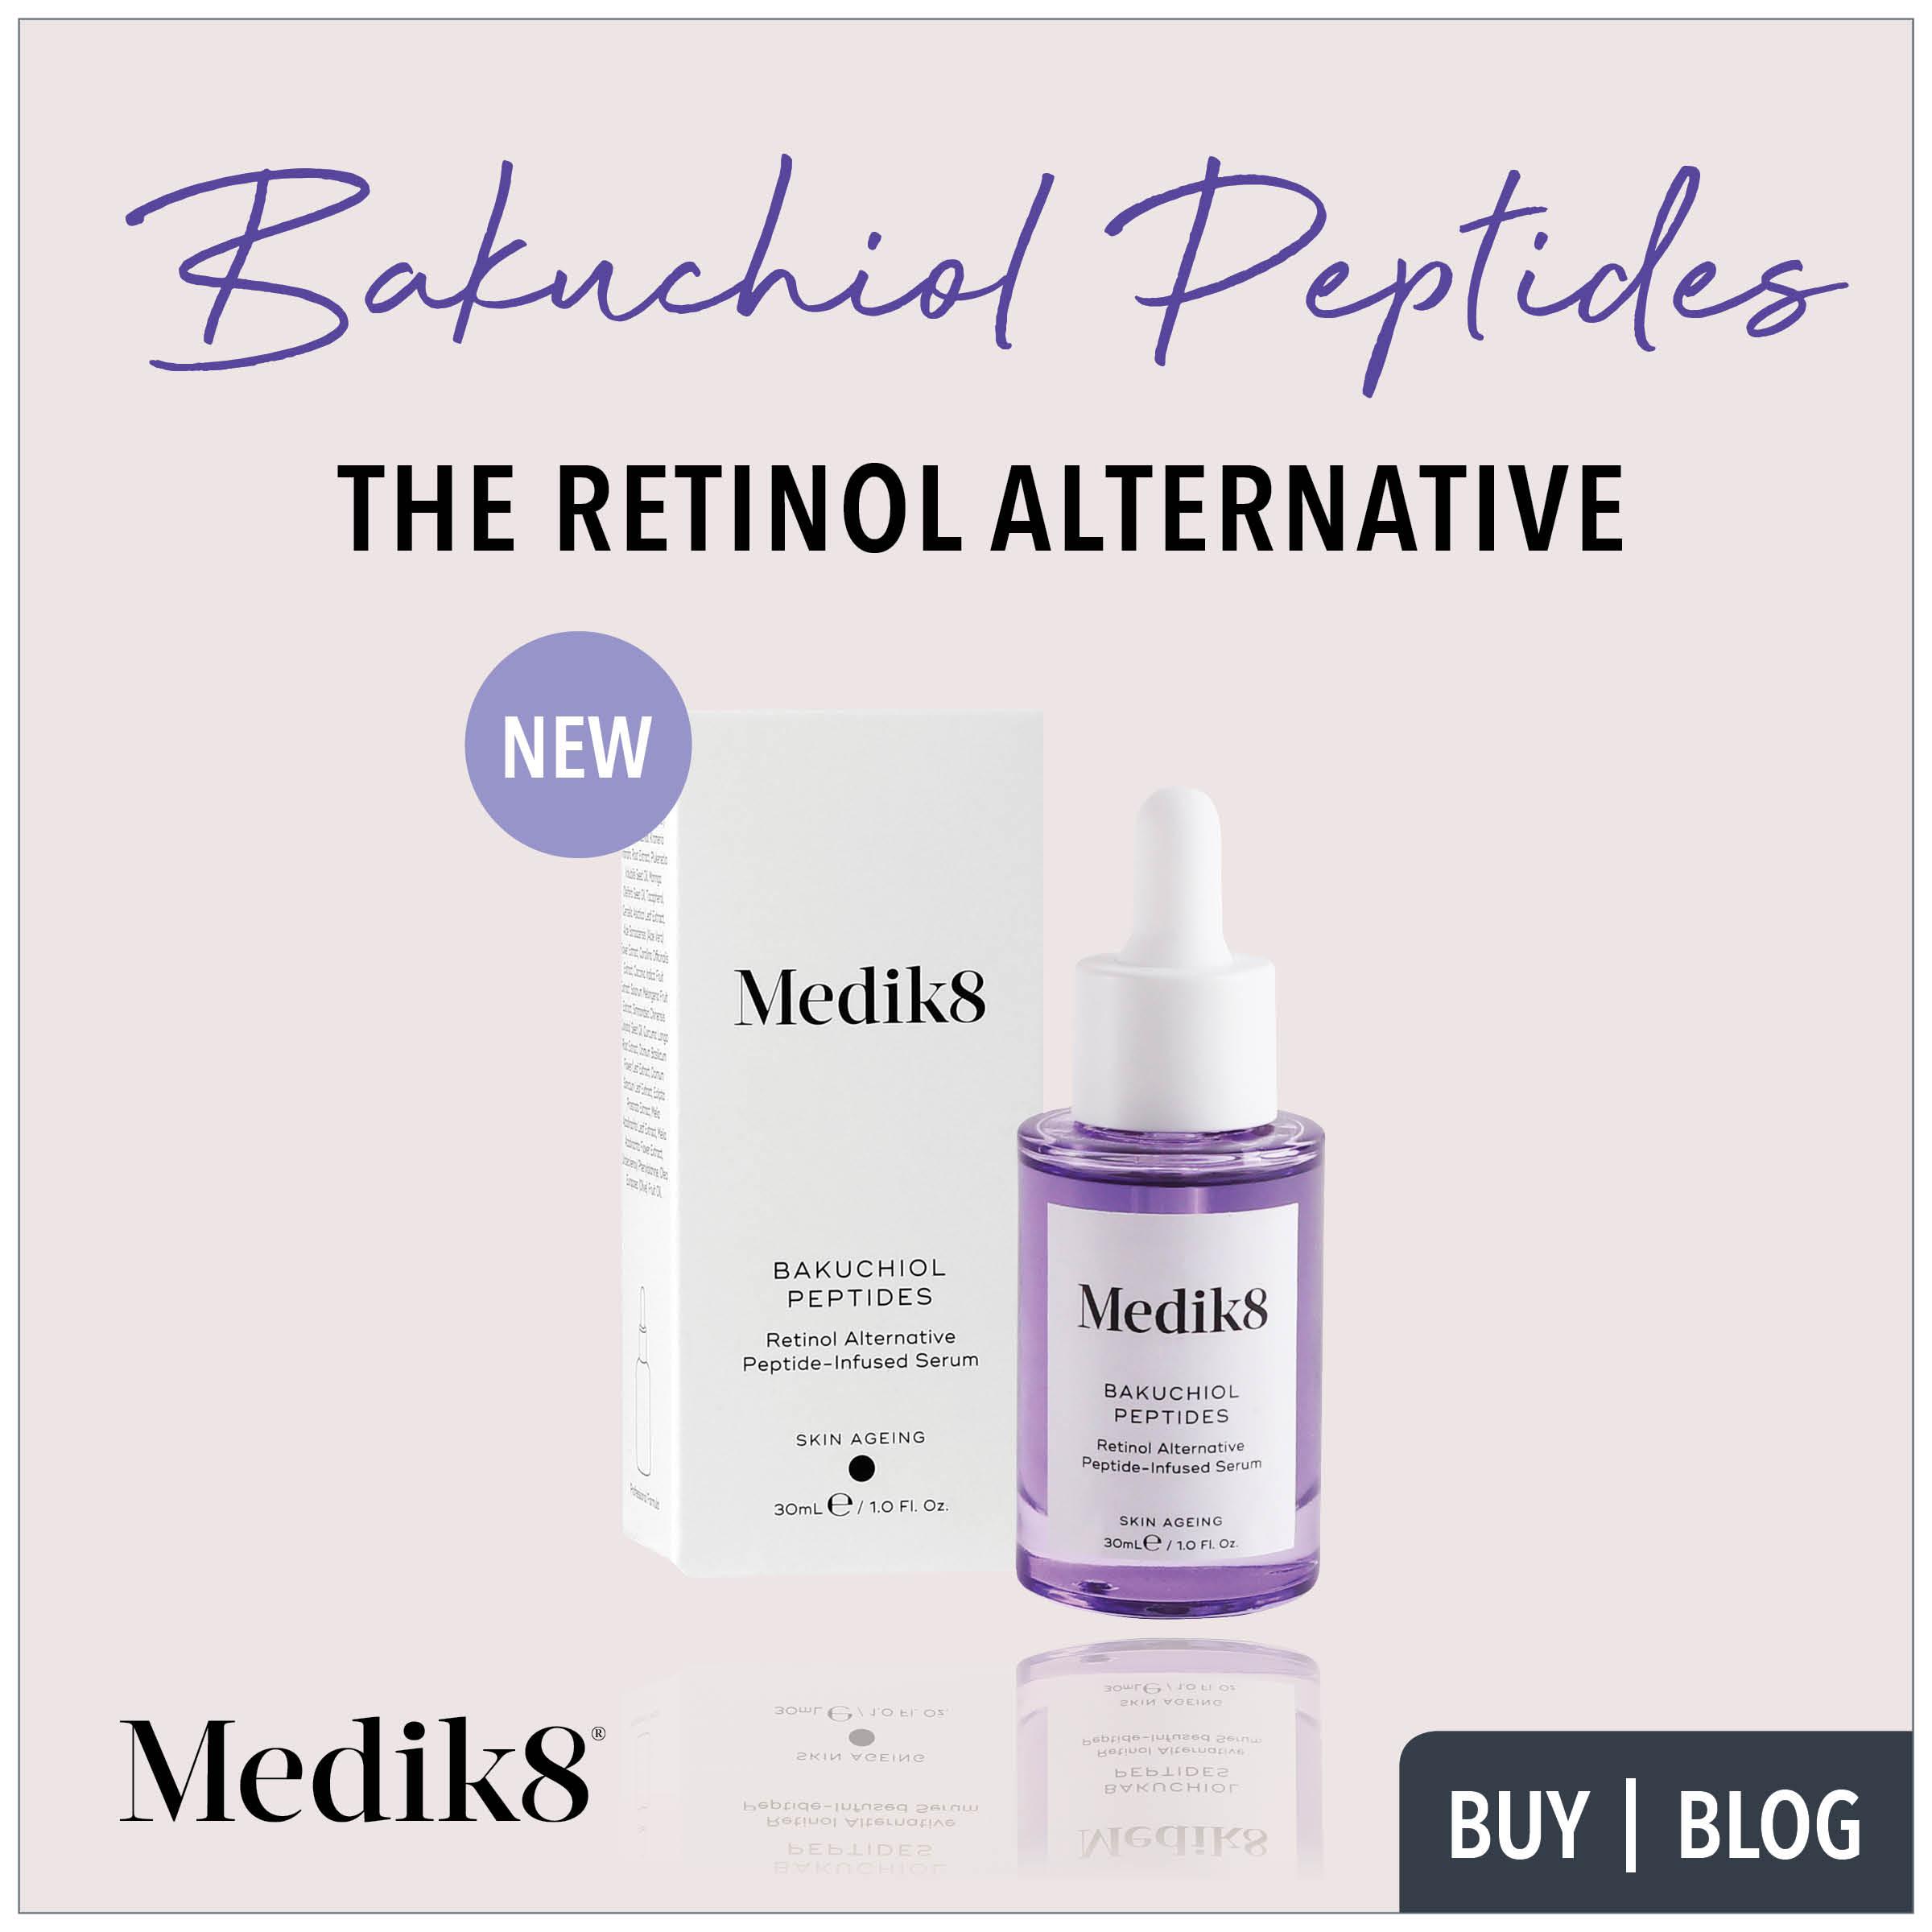 medik8 bakuchiol peptides from prodermal